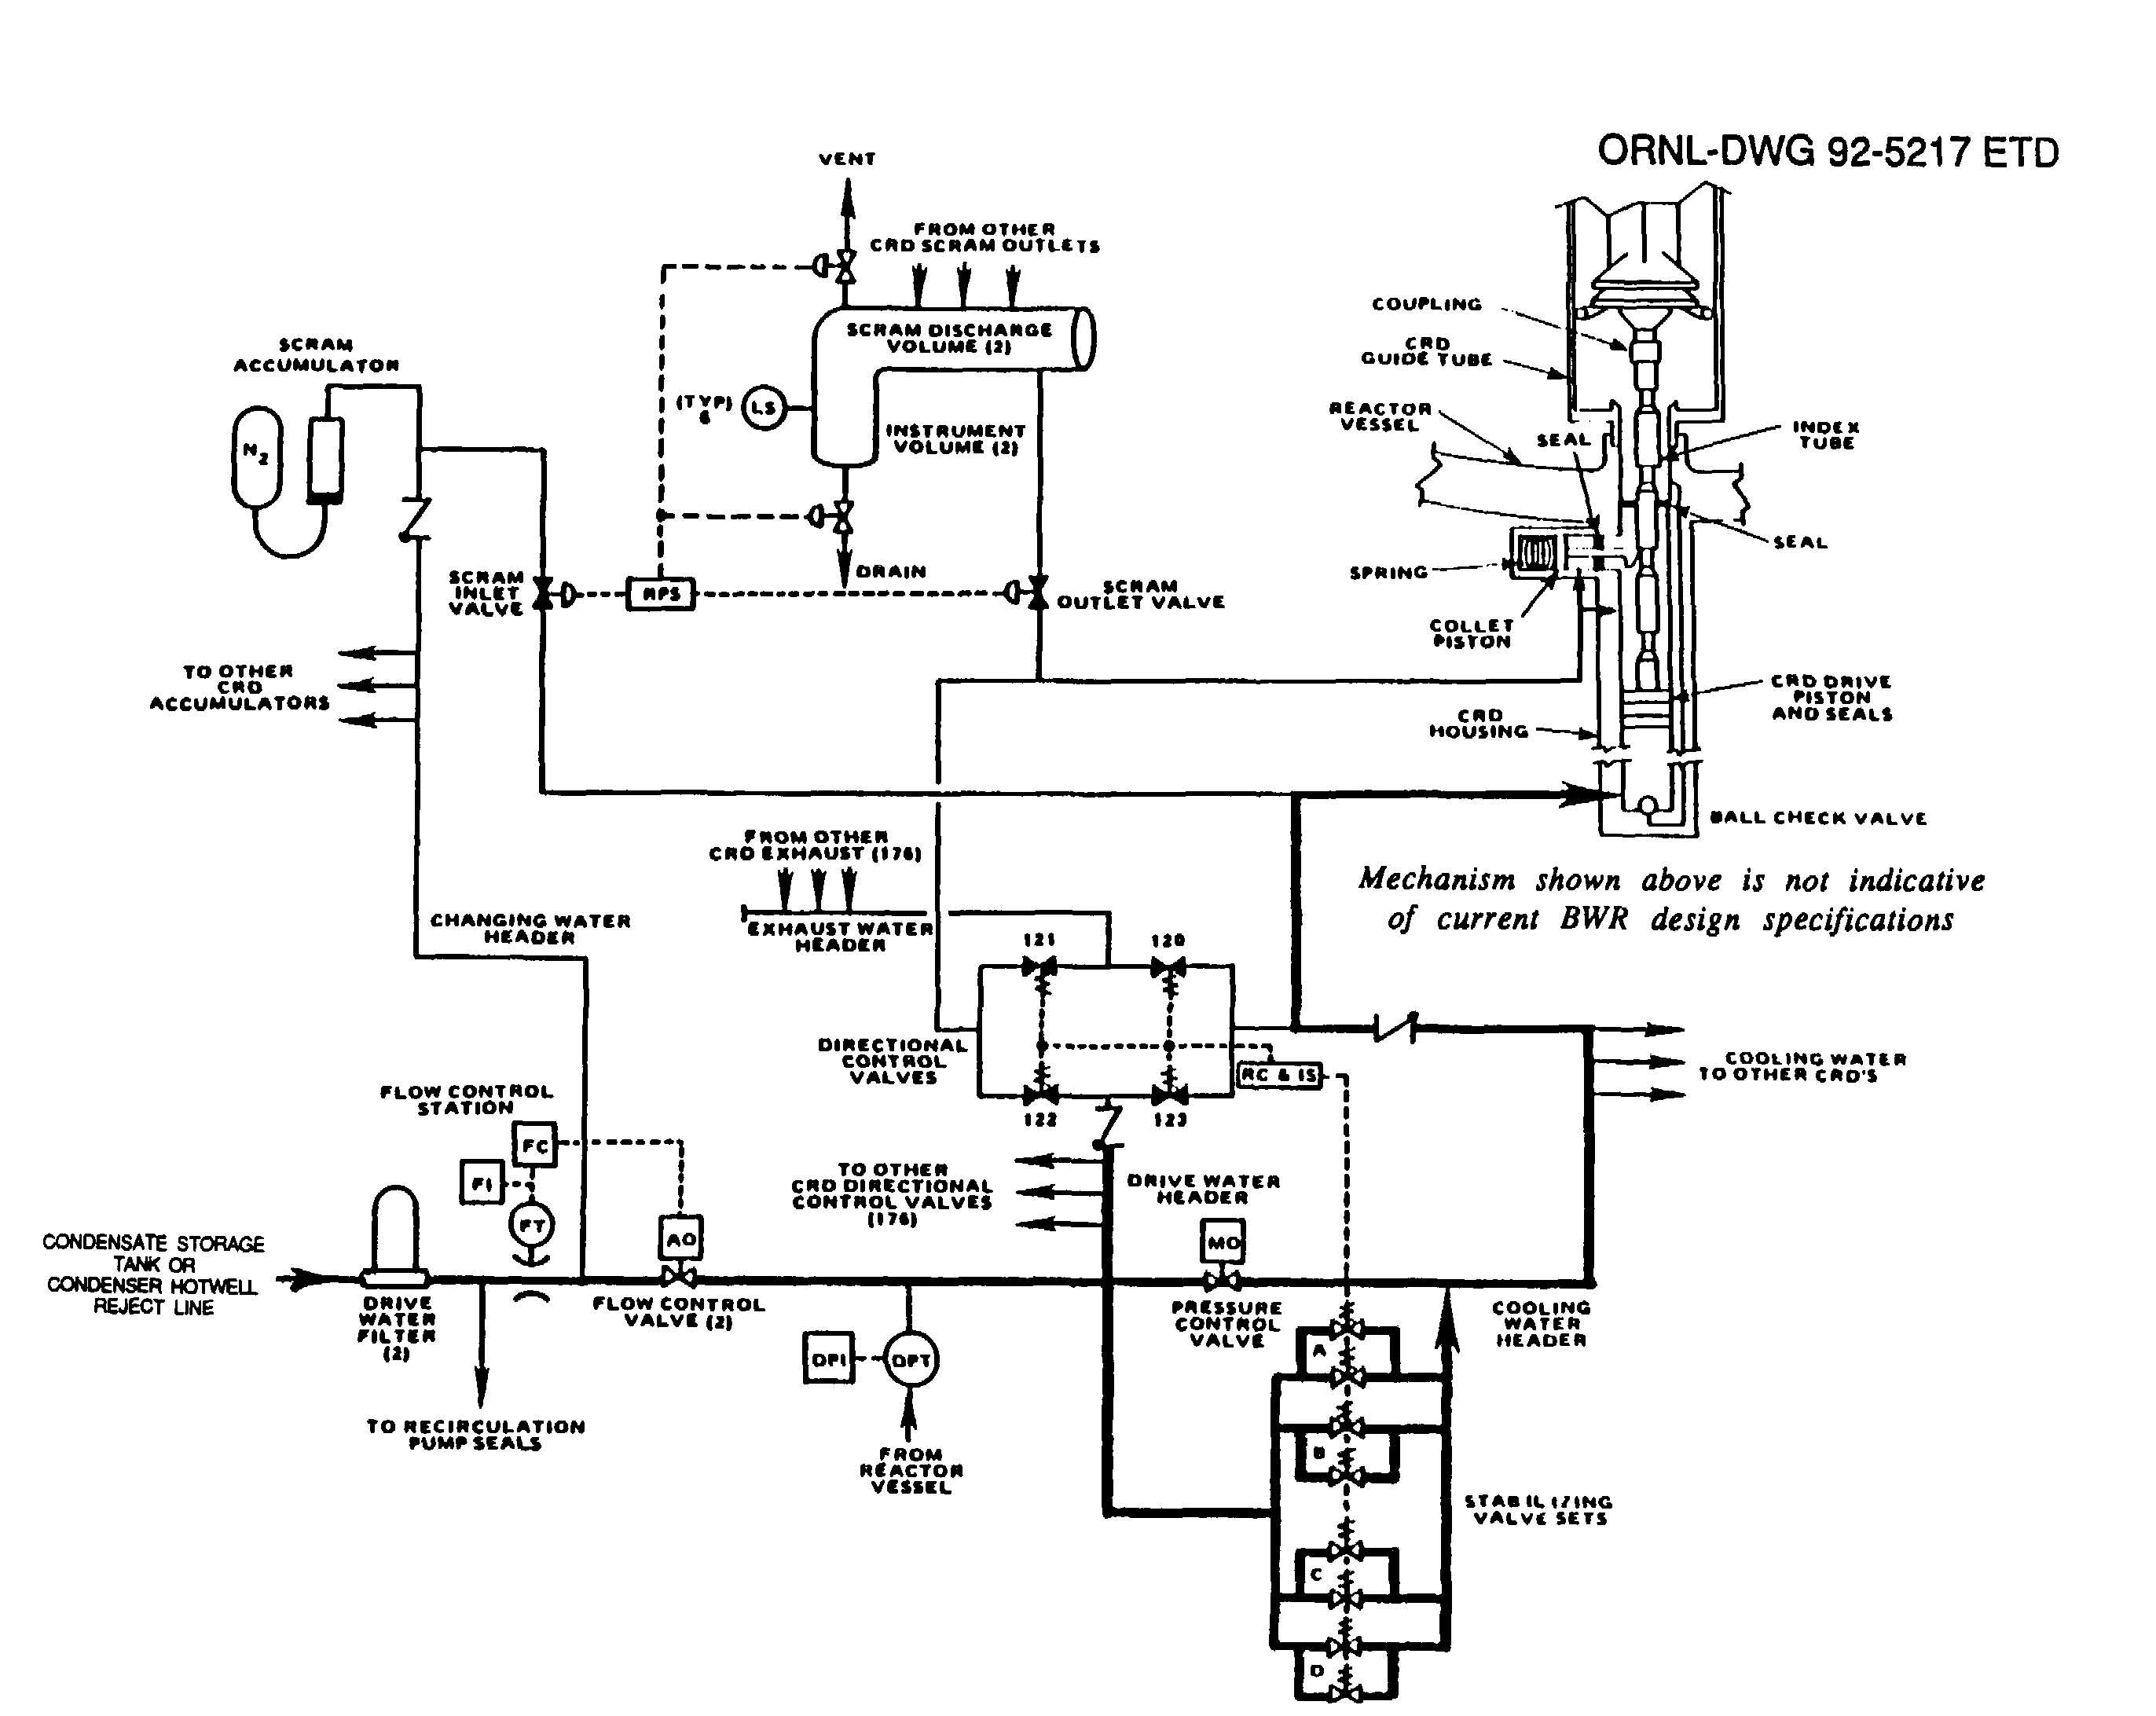 Core Tank Hydraulic Schematic Best Secret Wiring Diagram Simple Circuit Basic April 4 2011 Update Reactors Spent Fuel Radiation And Rh Josephmiller Typepad Com Electrical